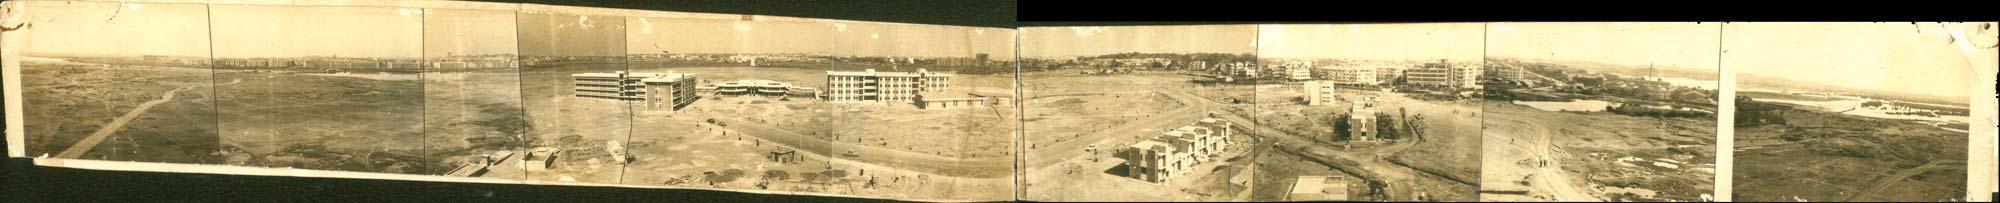 Vidyanagari Campus - mid 70's